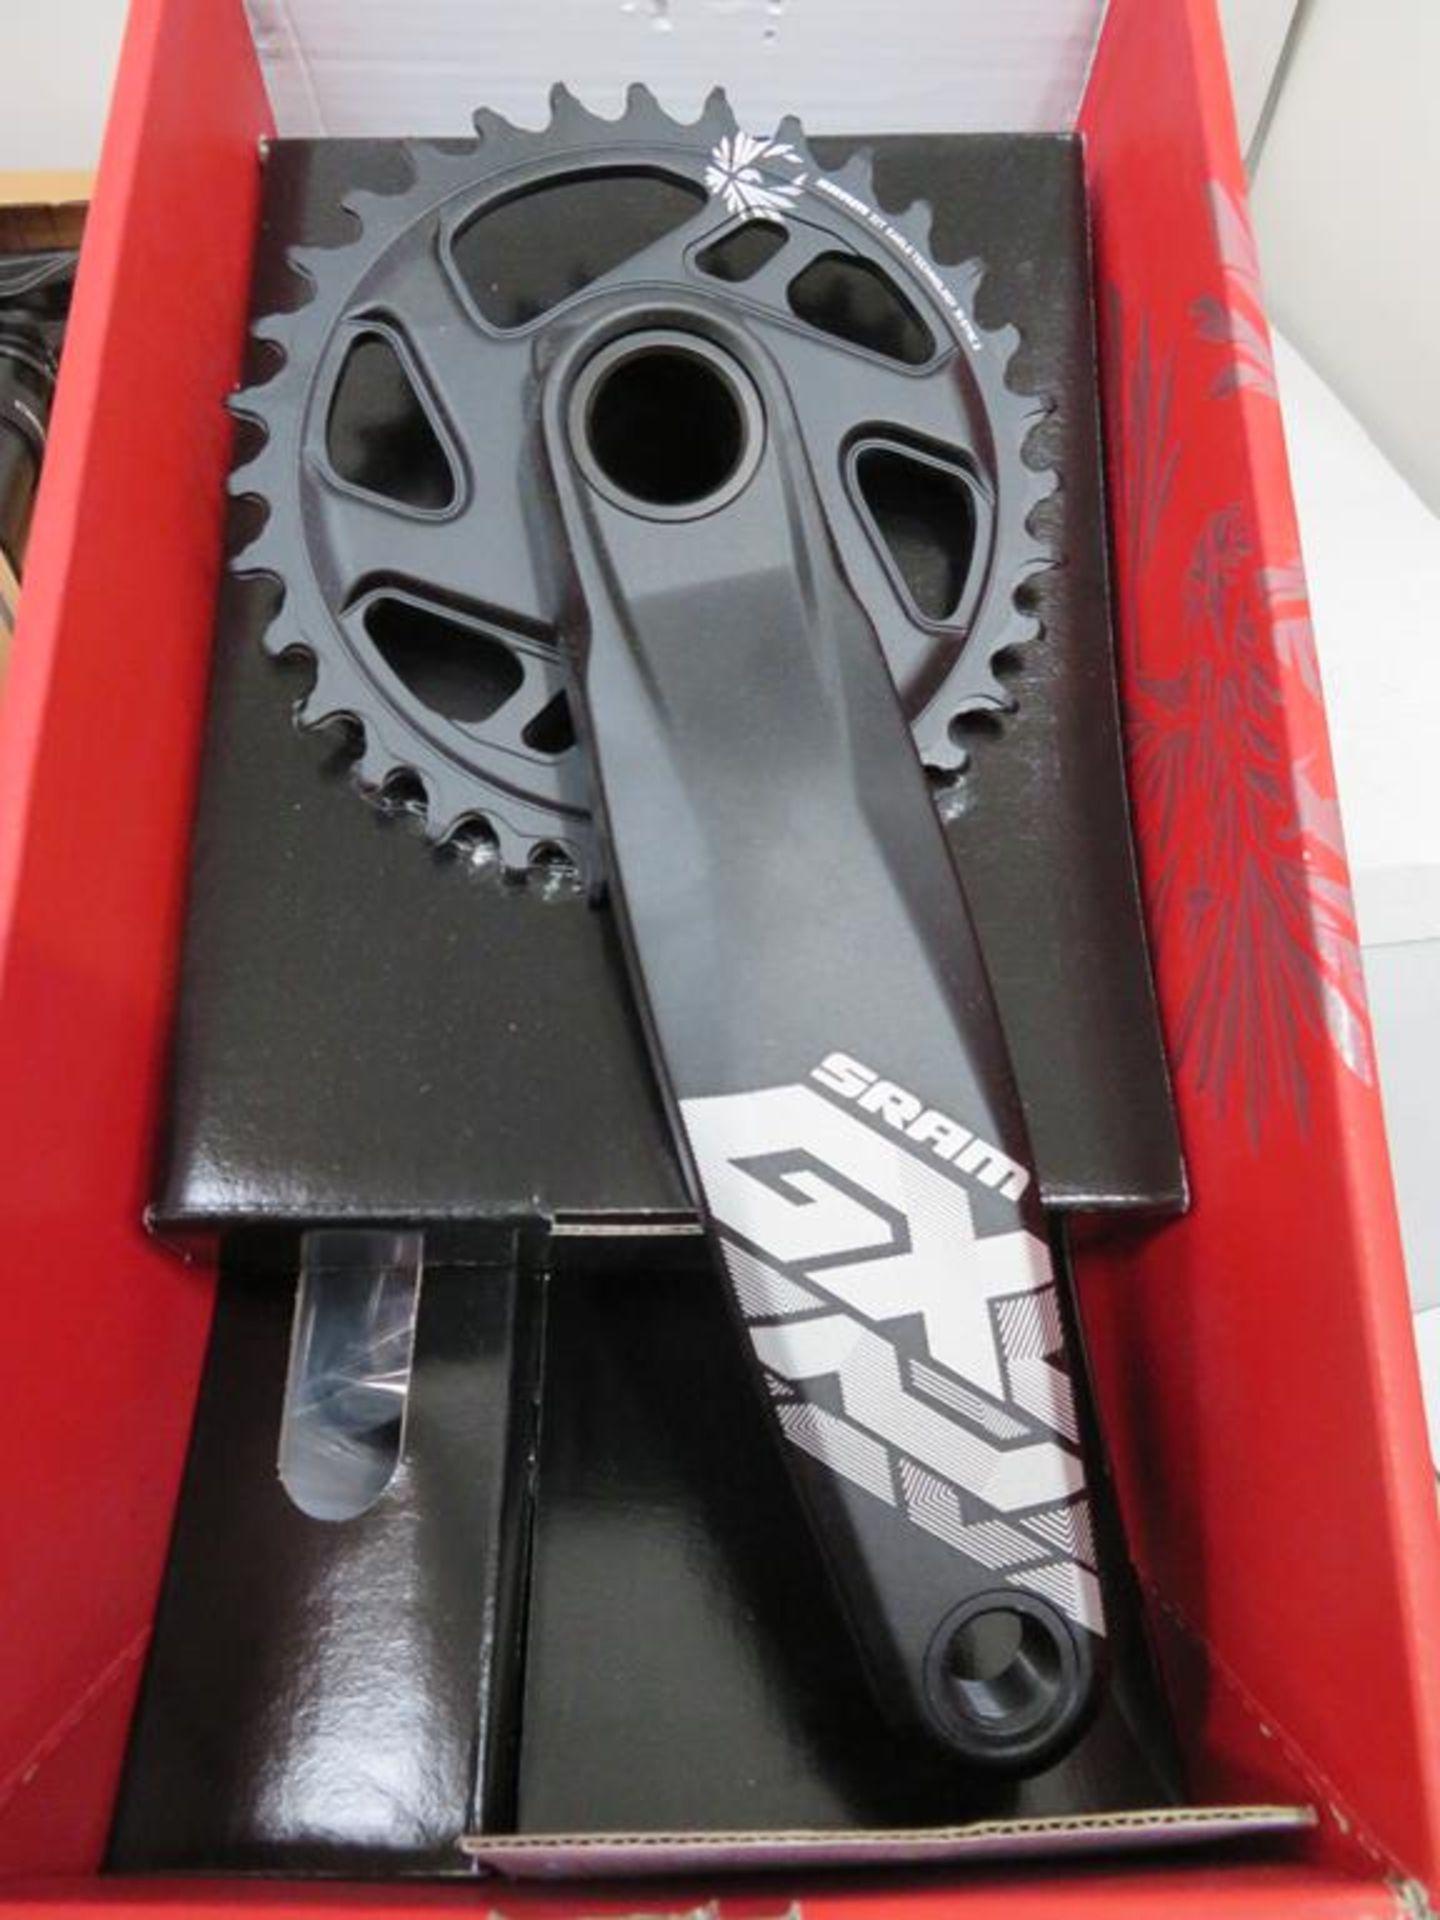 Lot 59 - SRAM Crank GX Eagle Boost GXP Direct Mount Chainring